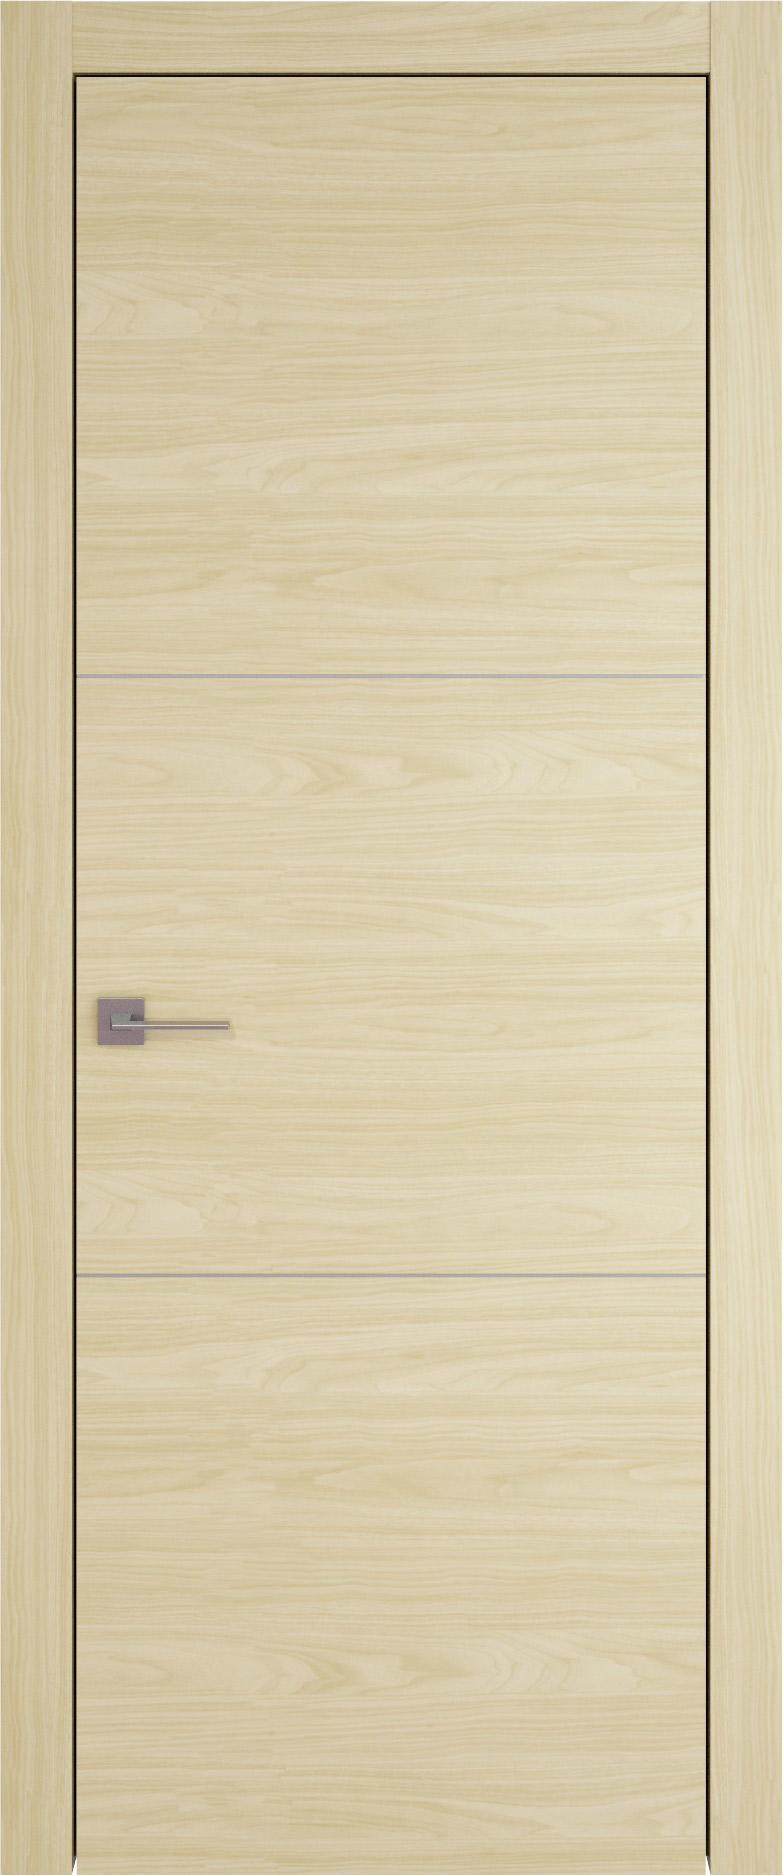 Tivoli В-3 цвет - Дуб нордик Без стекла (ДГ)